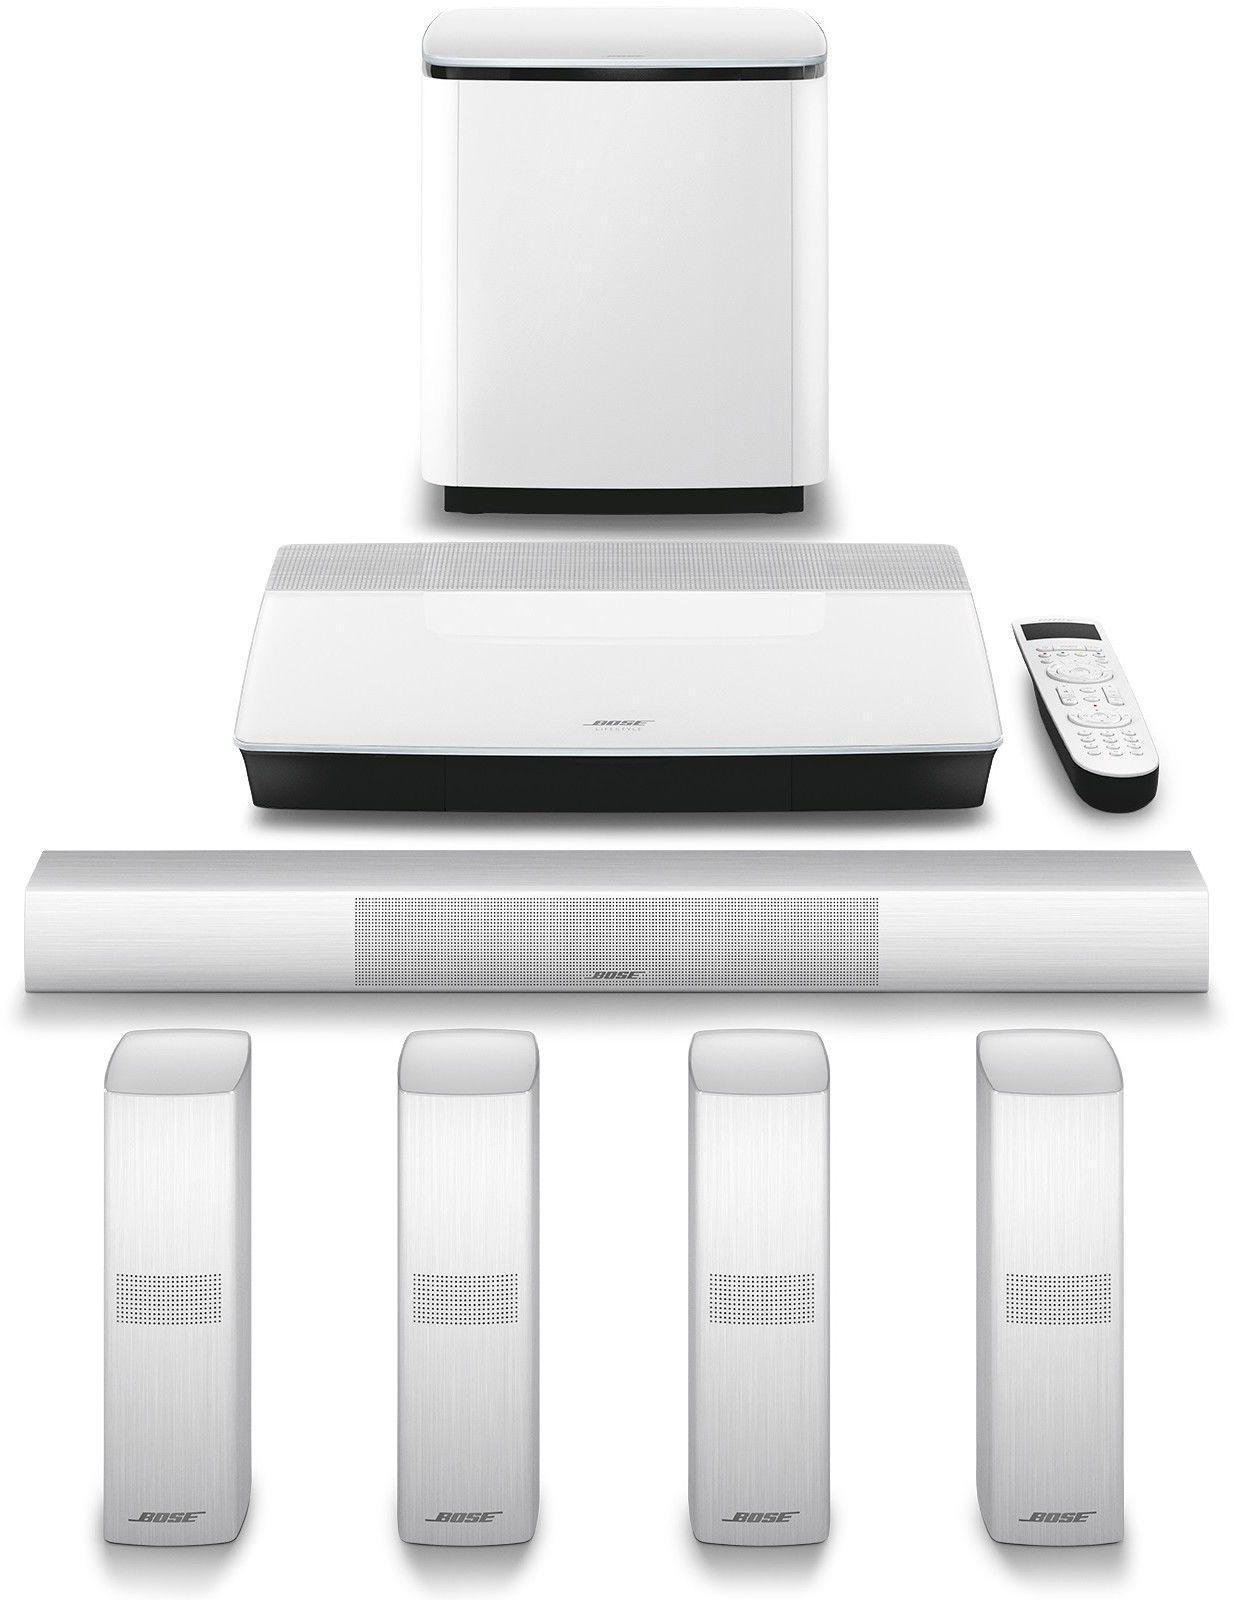 Bose Lifestyle 650 BLK Dostępny! Zadzwoń Po Cenę!!